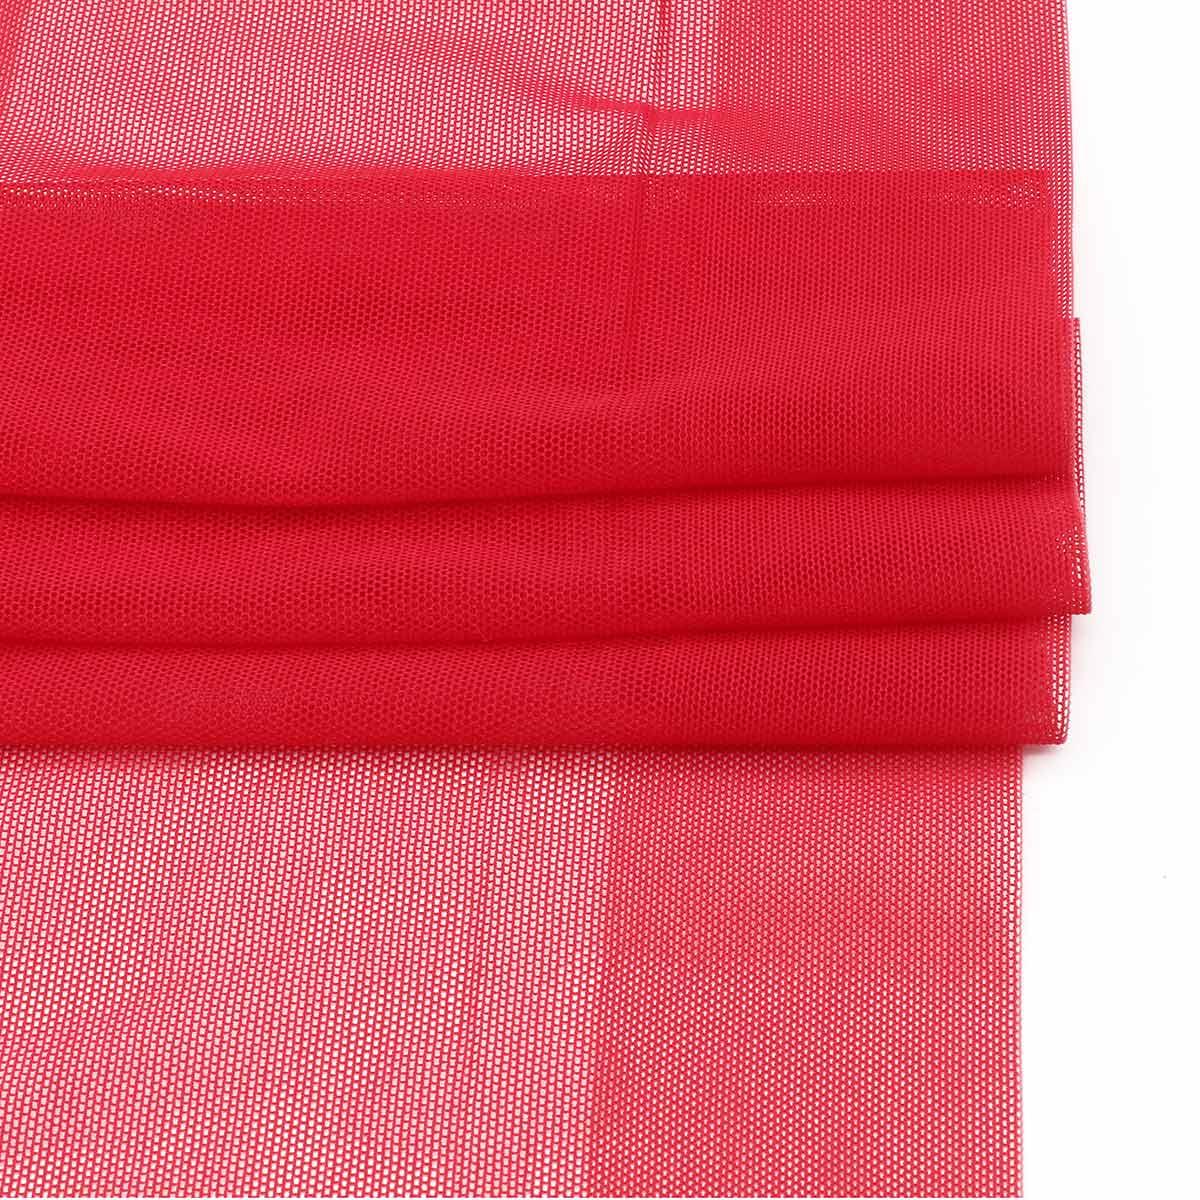 SU 56 Ткань эластичная бельевая 13,5 см*10